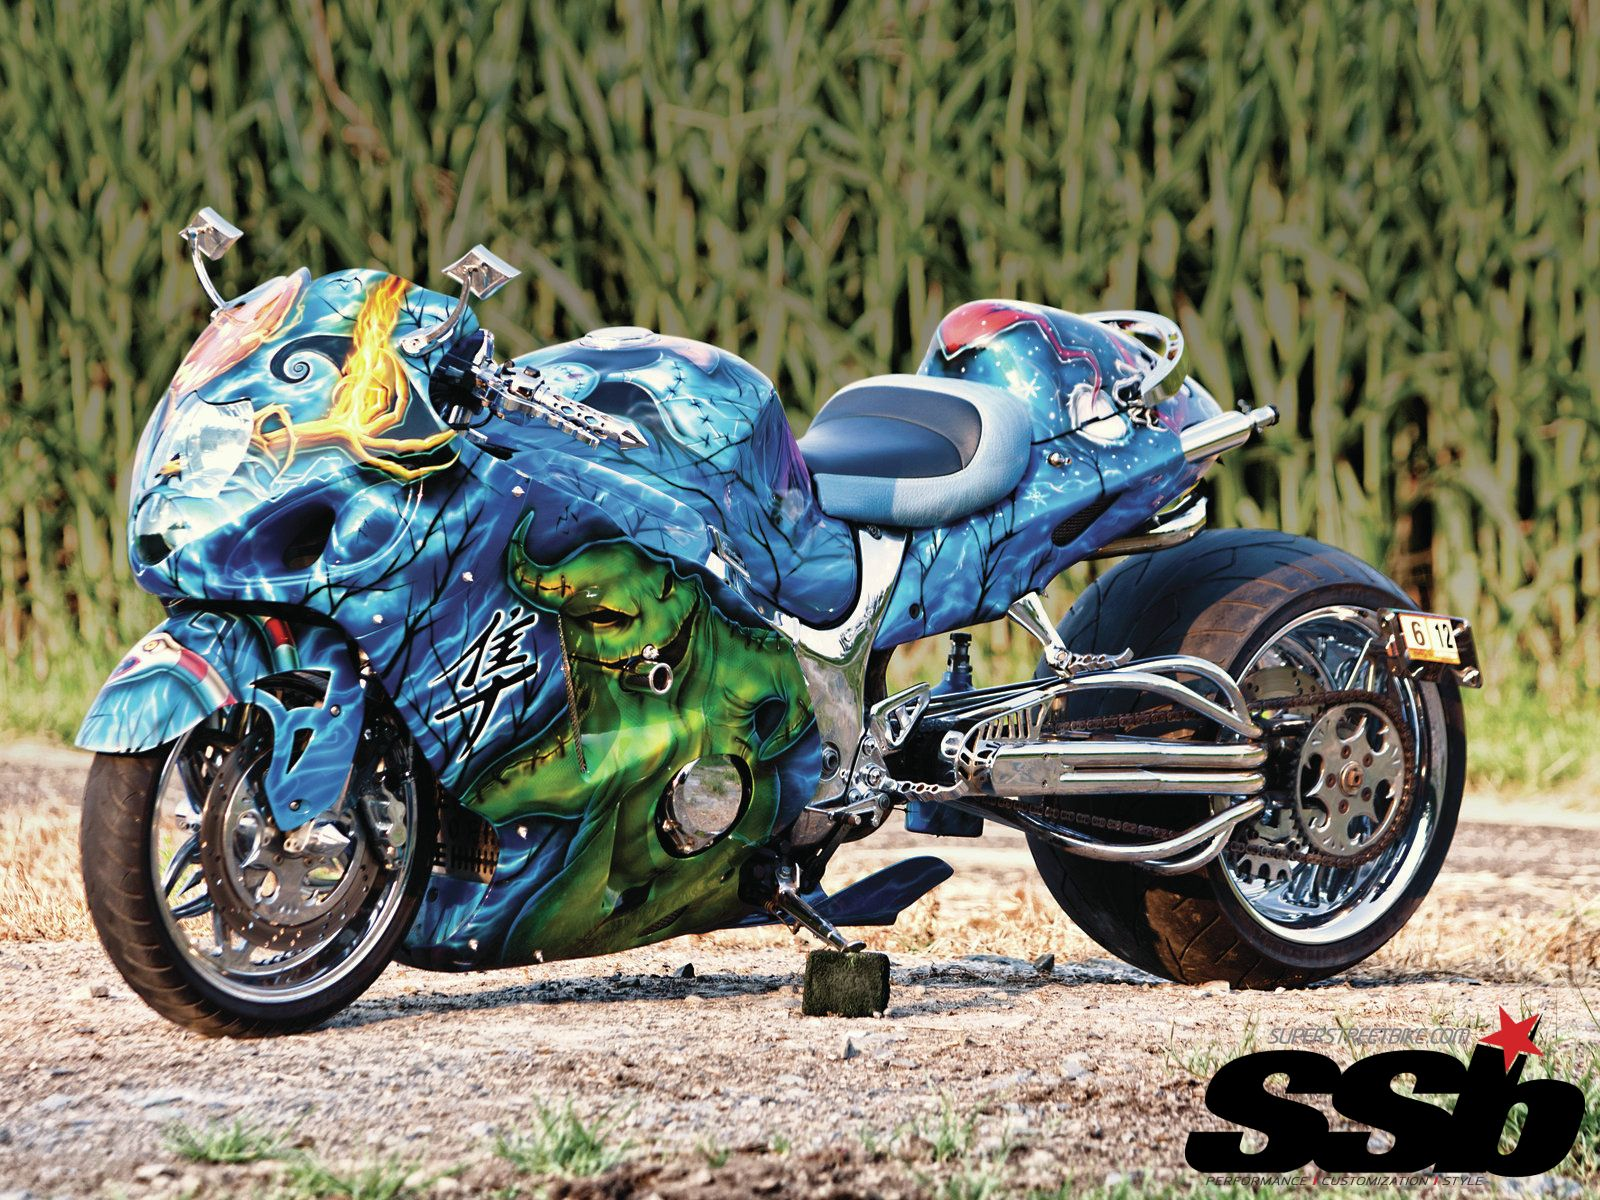 hayabusa tuning motorbikes 2560 - photo #31